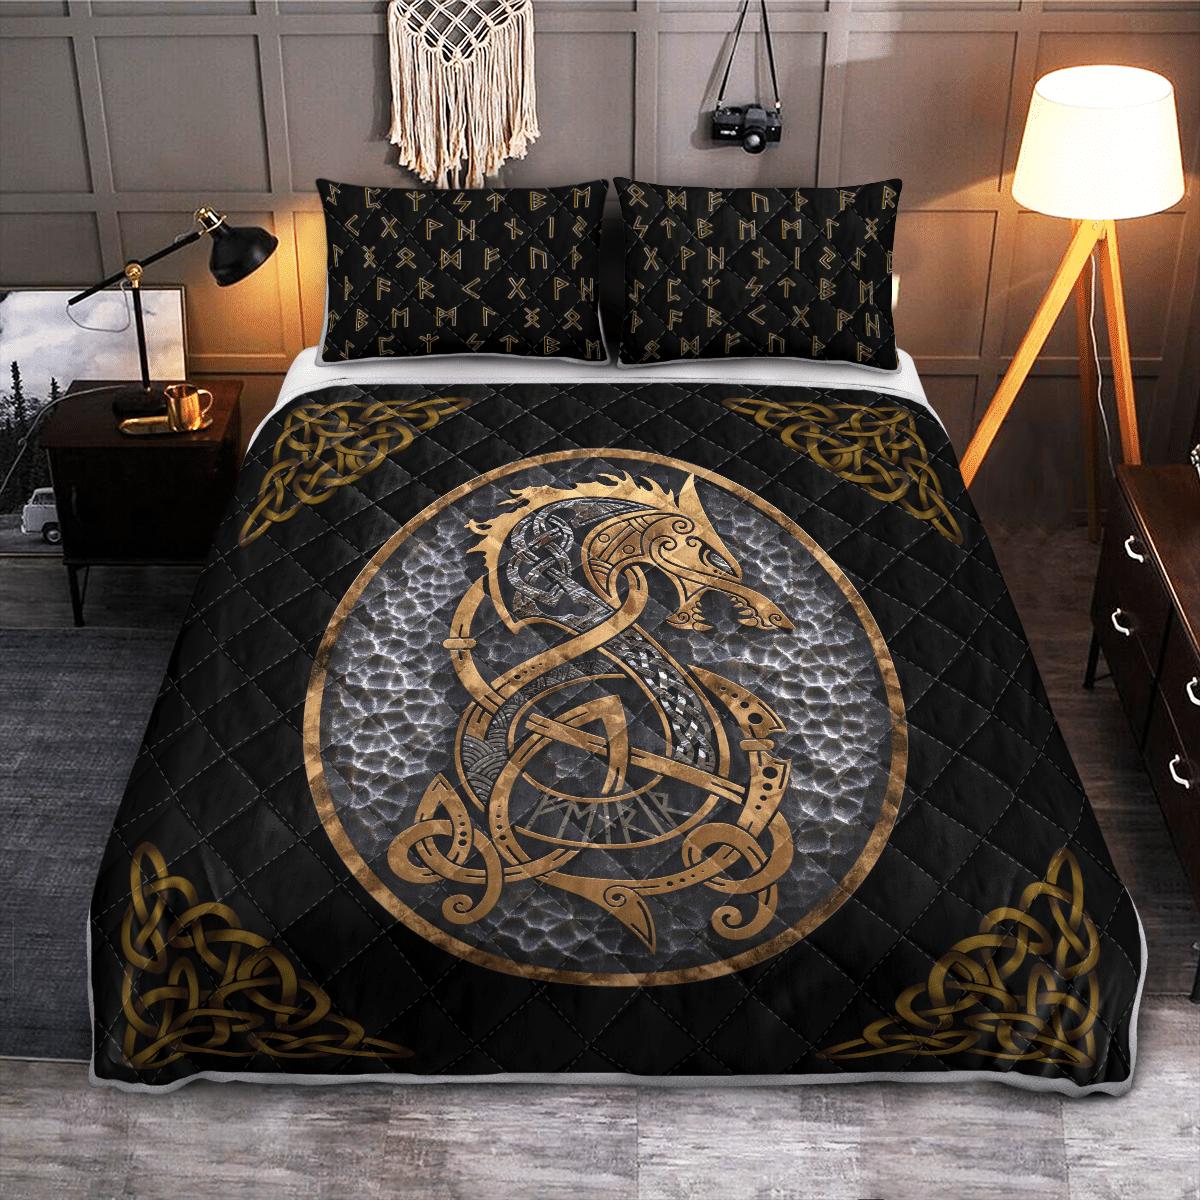 Fenrir Dragon Viking quilt bedding set 1